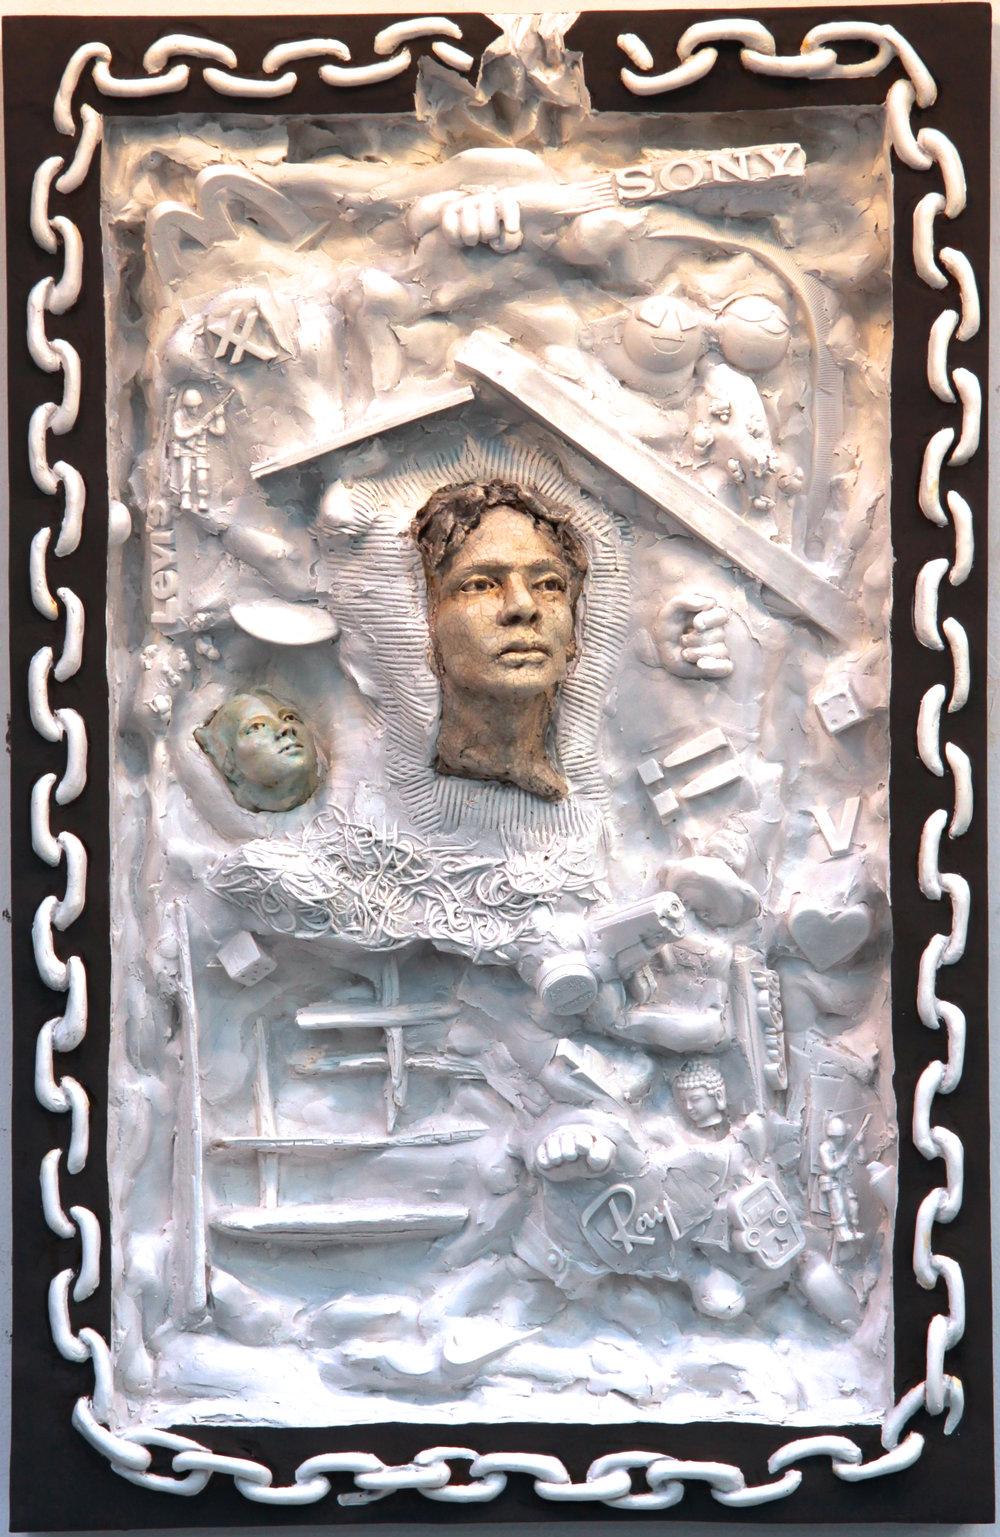 "(C)scape #34, Hydrocal, carrara marble, glazed stoneware, acrylic, 30.5"" x 18.5"" x 5""D, 2016."